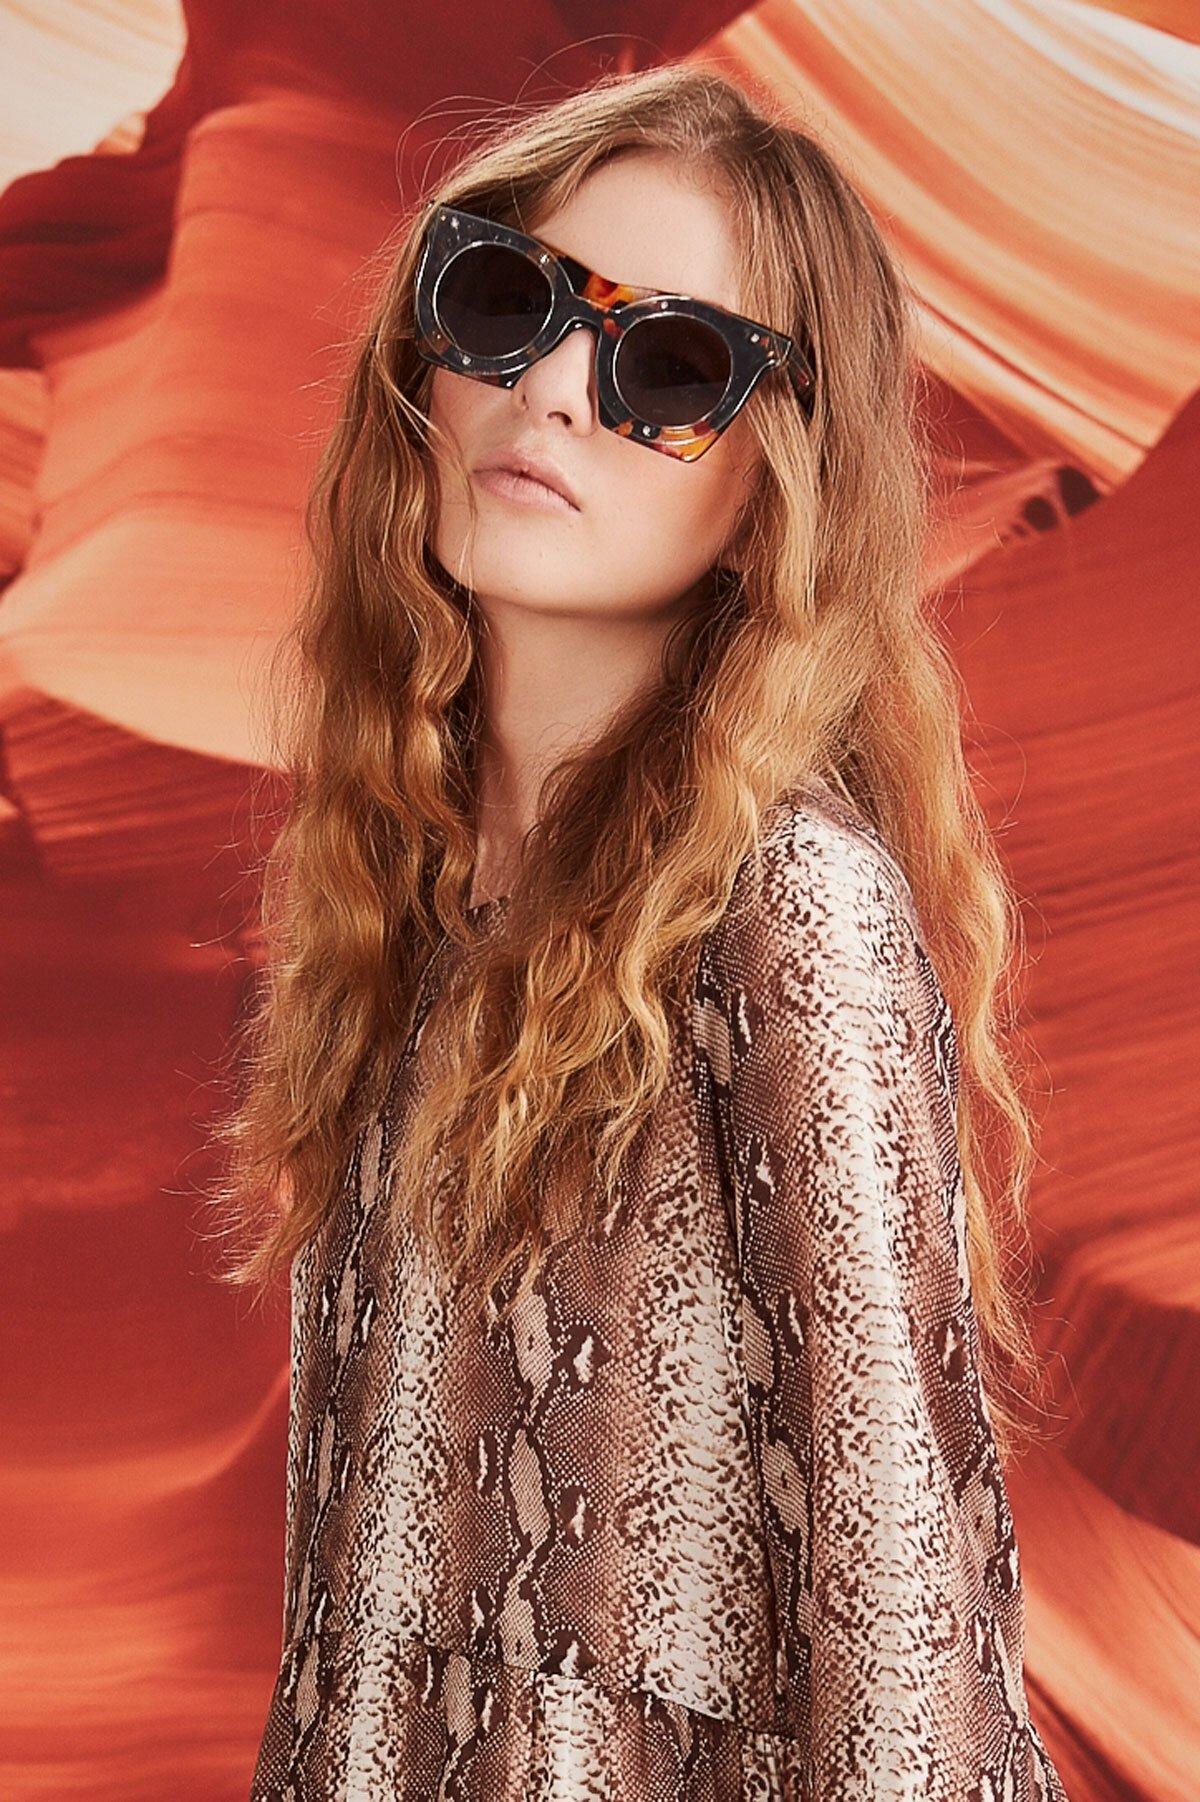 2a30590e50b HIP TO BE SQUARE SUNGLASSES - Eyewear-Sunglasses   Trelise Cooper ...